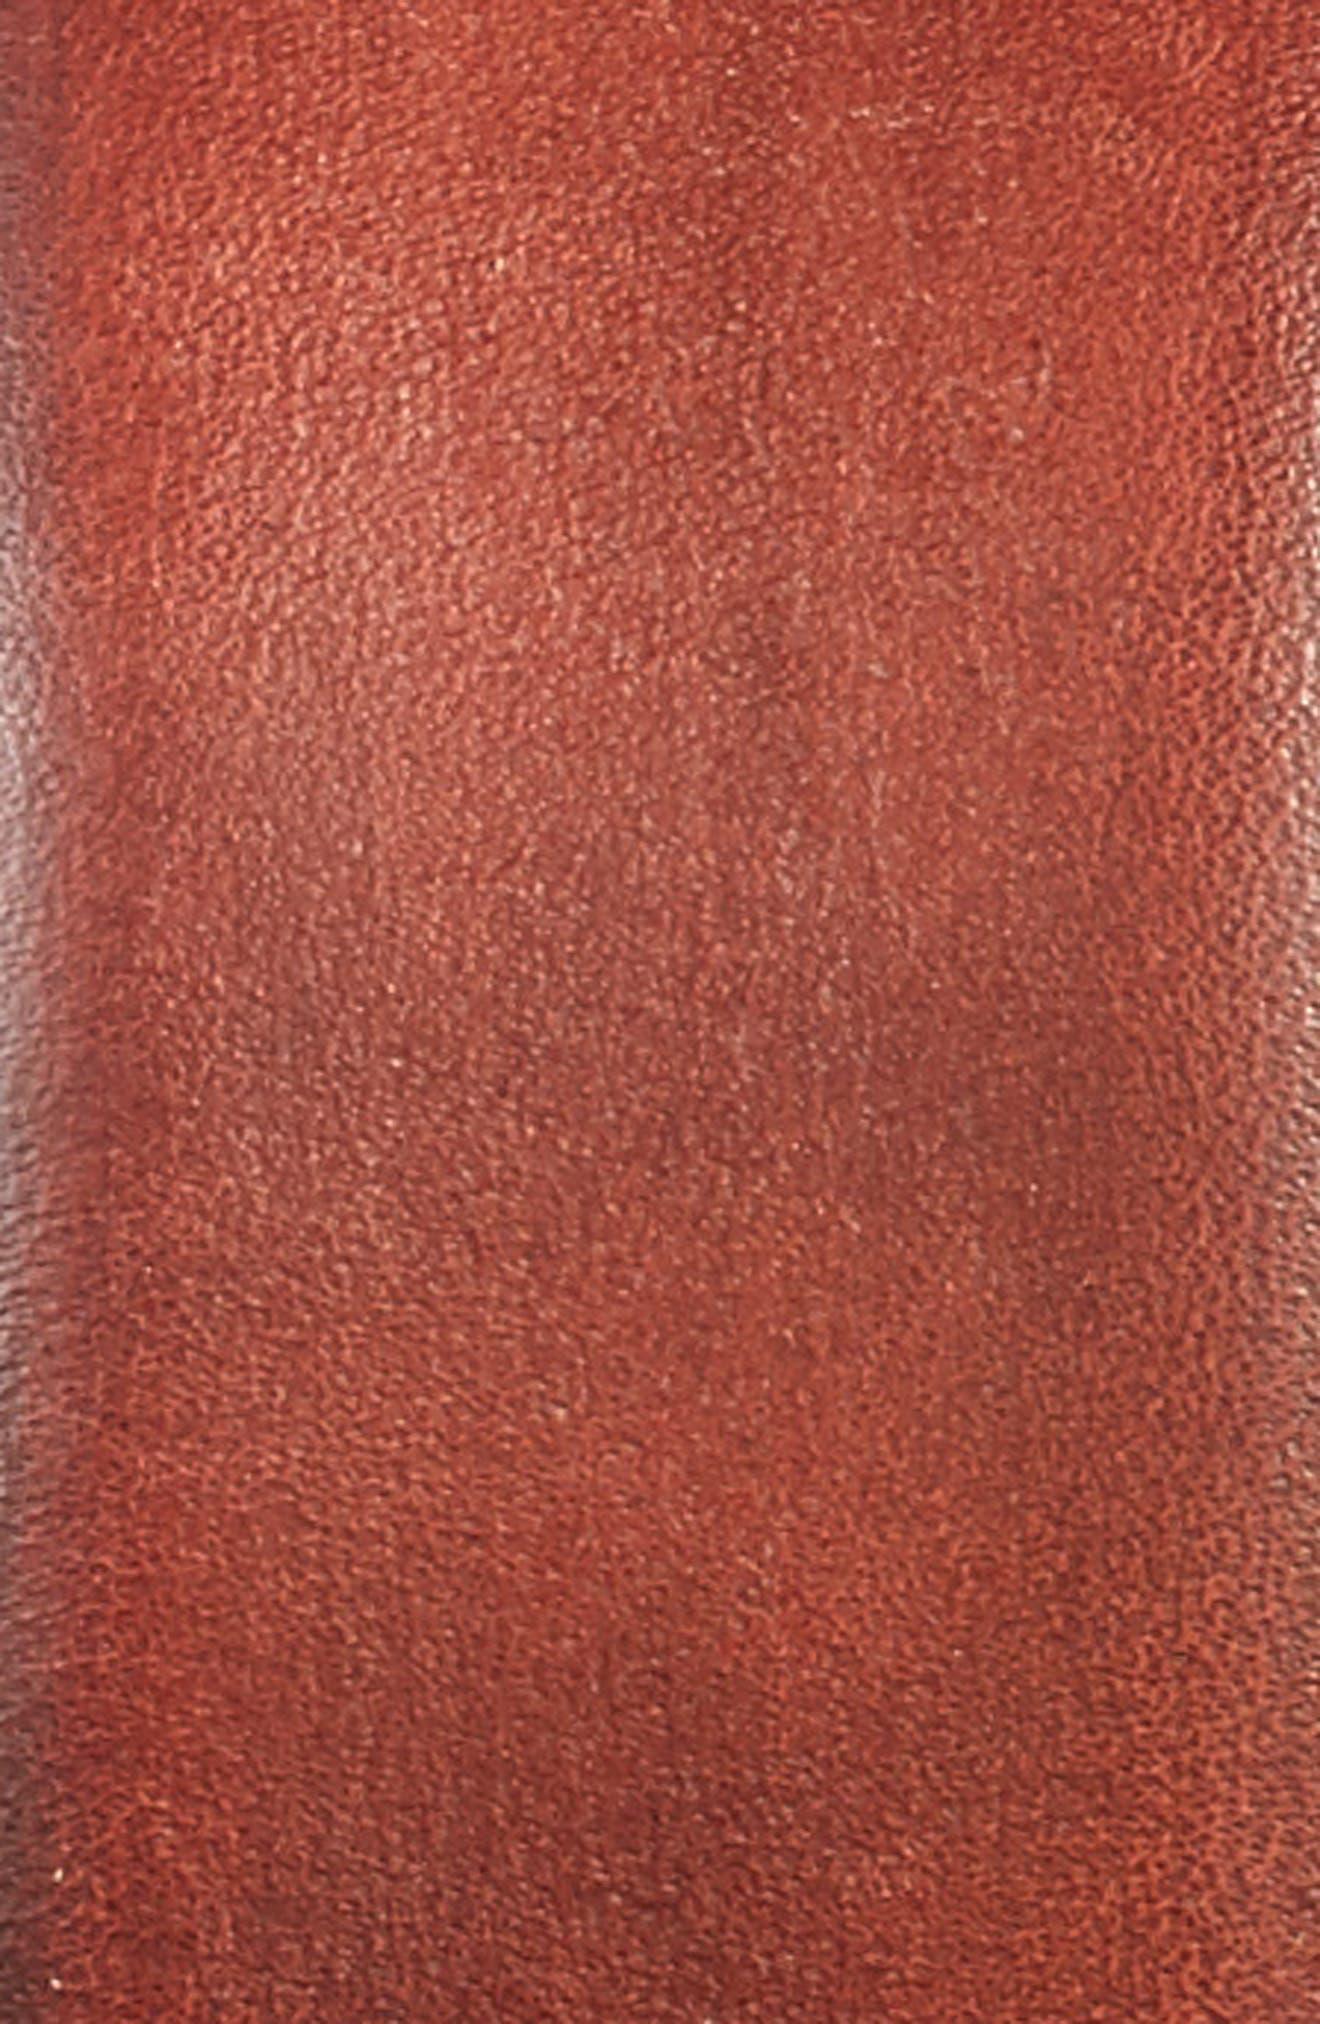 Hand Antiqued Leather Belt,                             Alternate thumbnail 2, color,                             Brown